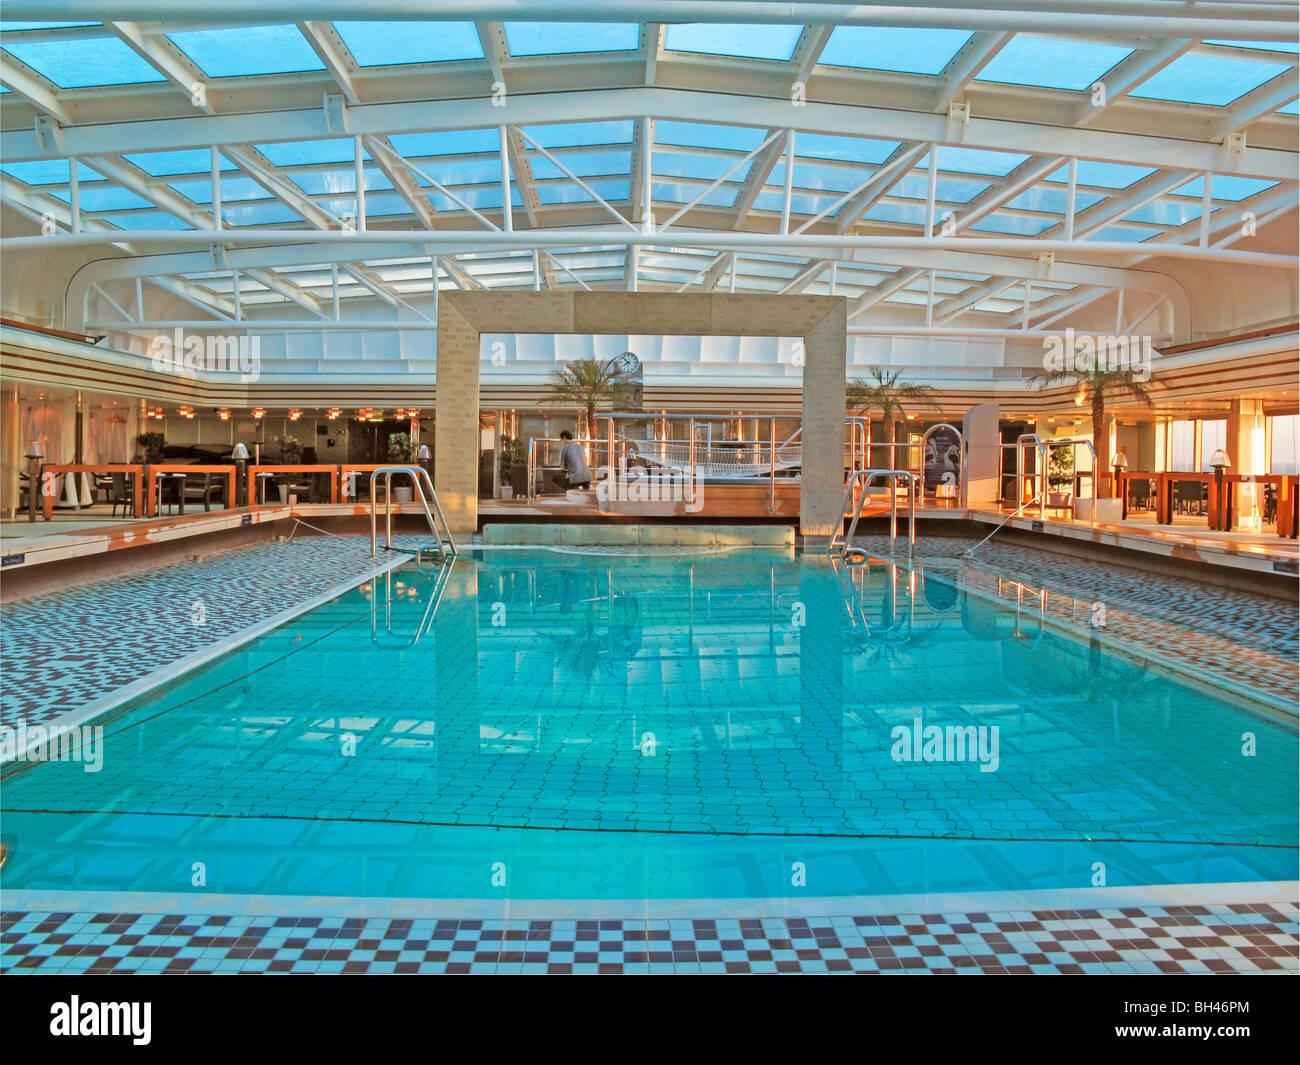 Eurodam Cruise Ship Pool Stock Photo Royalty Free Image - Eurodam cruise ship